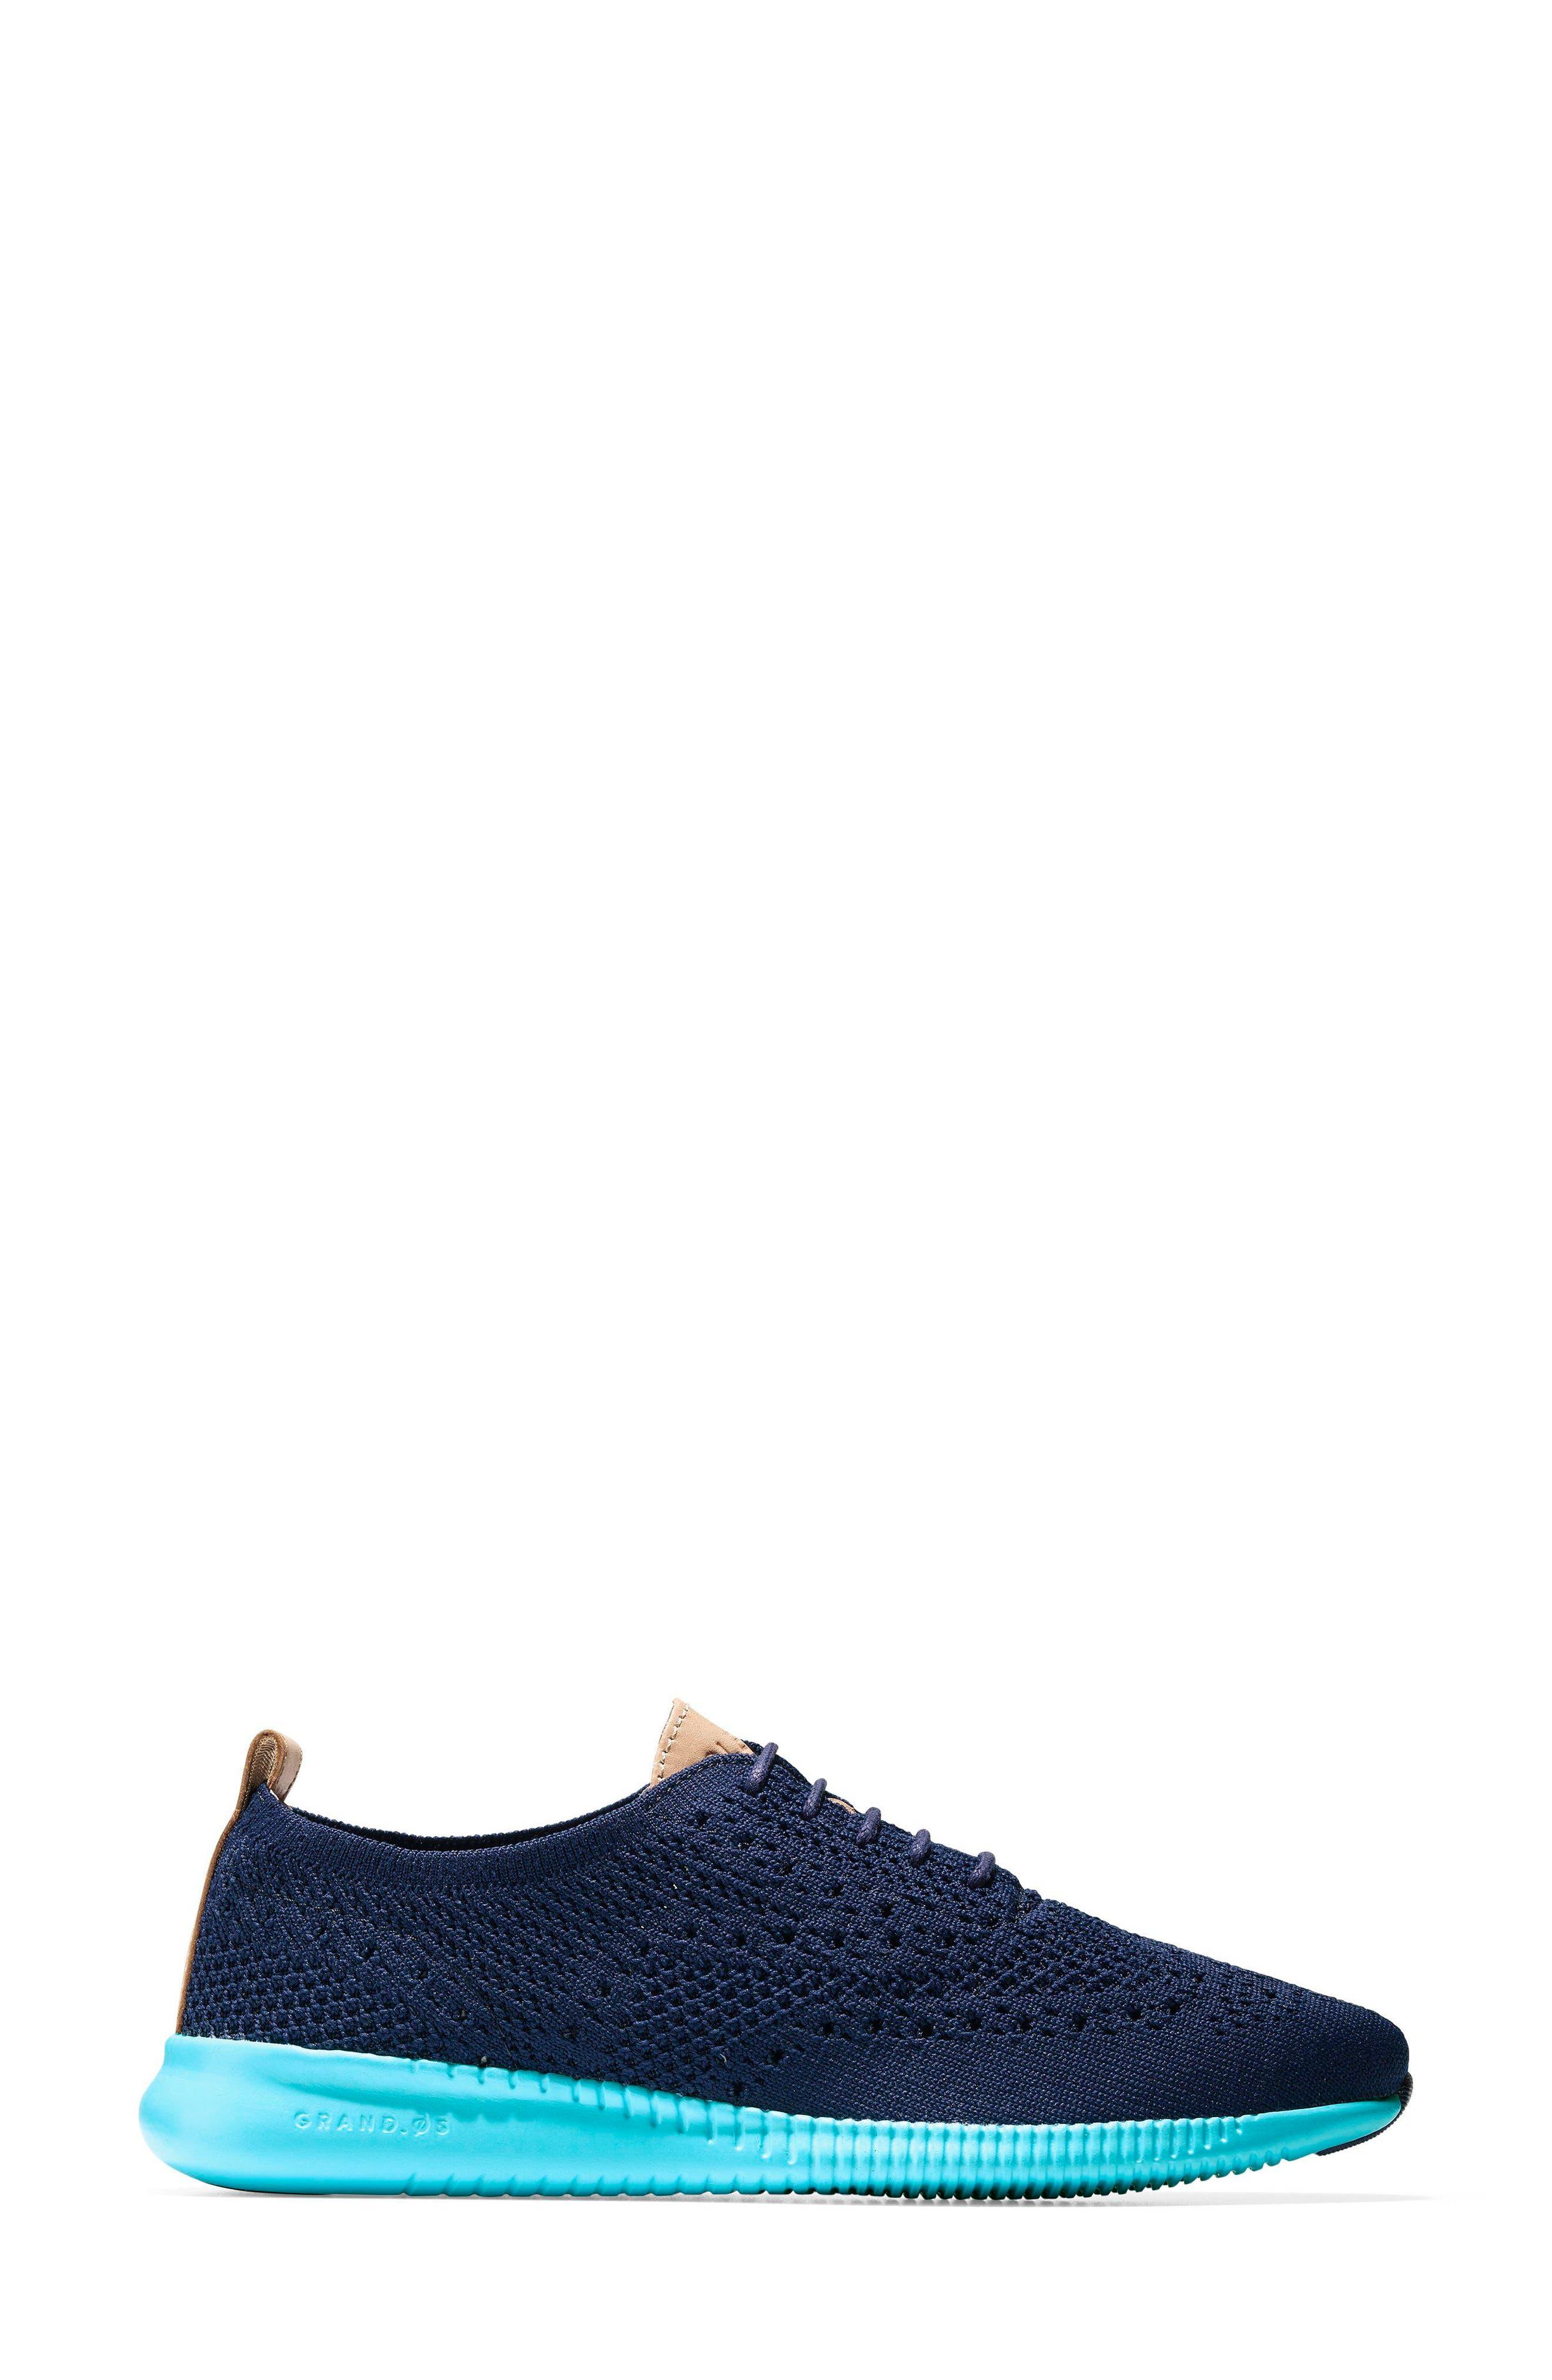 2.ZERØGRAND Stitchlite Wingtip Sneaker,                             Alternate thumbnail 3, color,                             MARINE BLUE/ BLUEFISH FABRIC